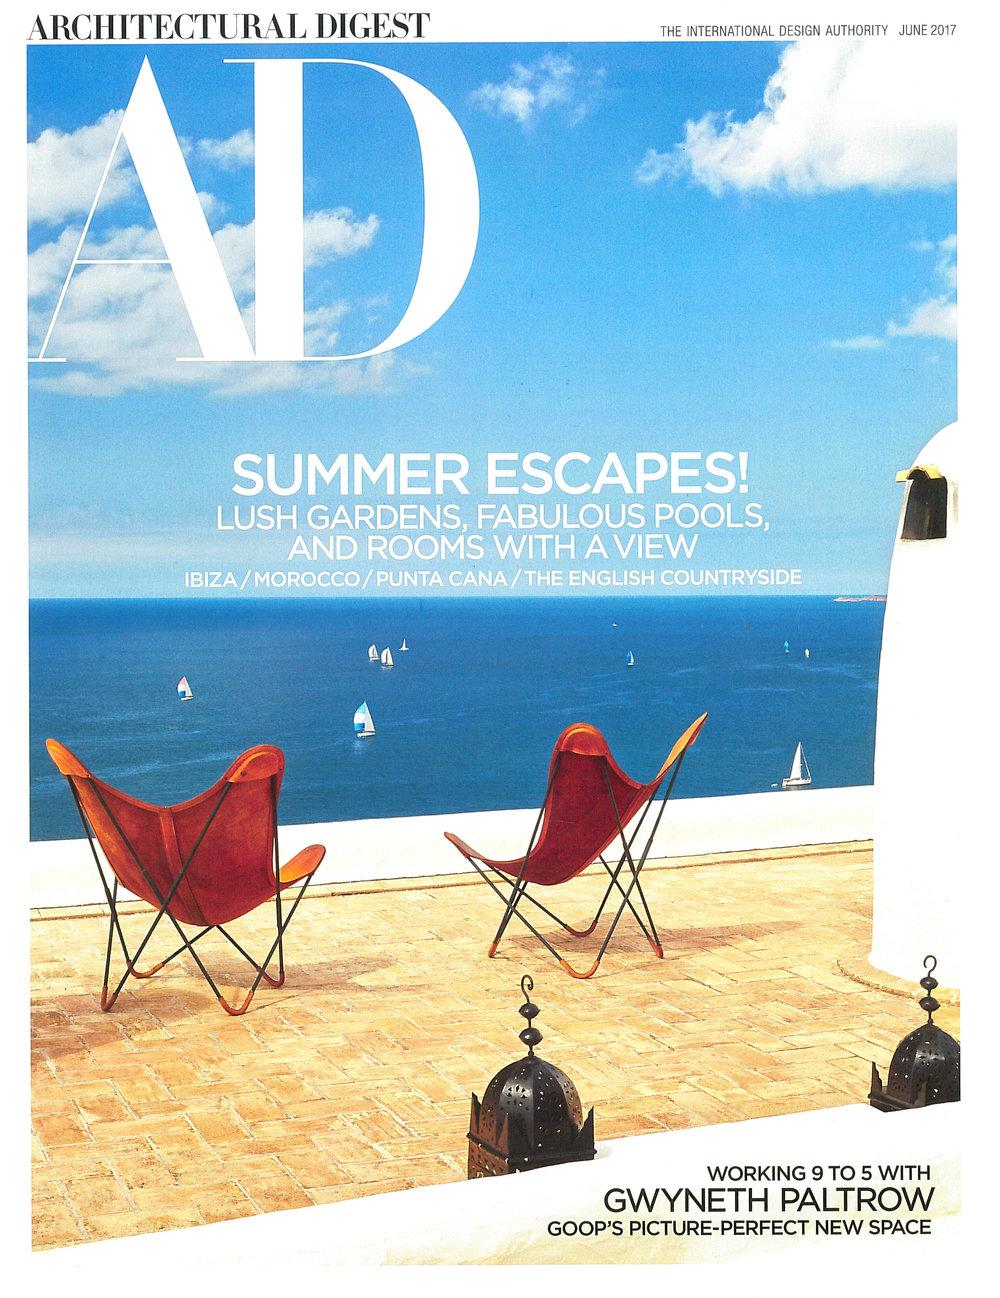 Architectural Digest -June 2017